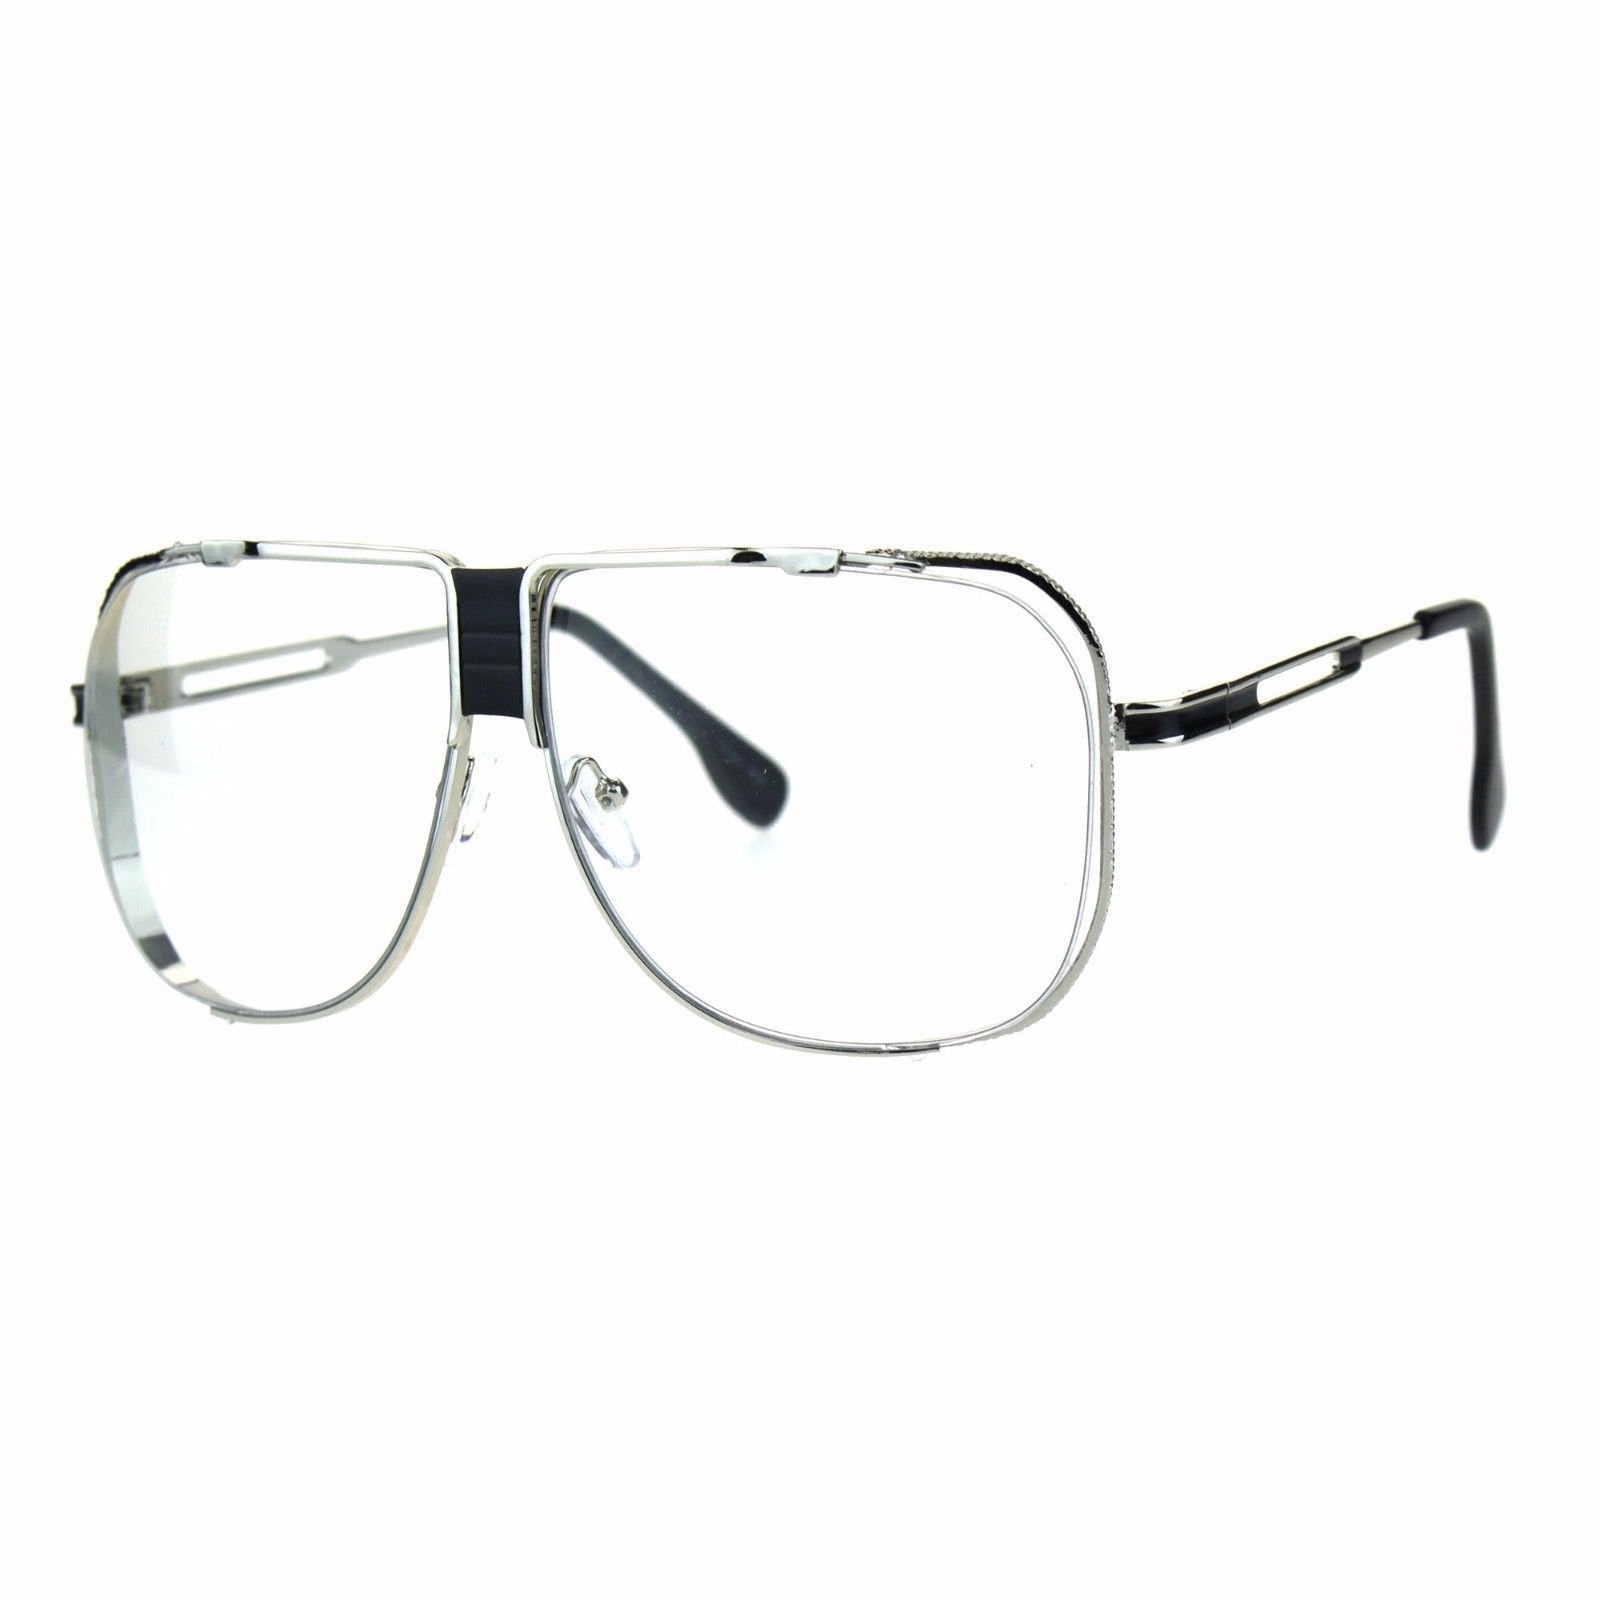 Clear Lens Fashion Glasses Vintage Oversized Square Metal Frame UV 400